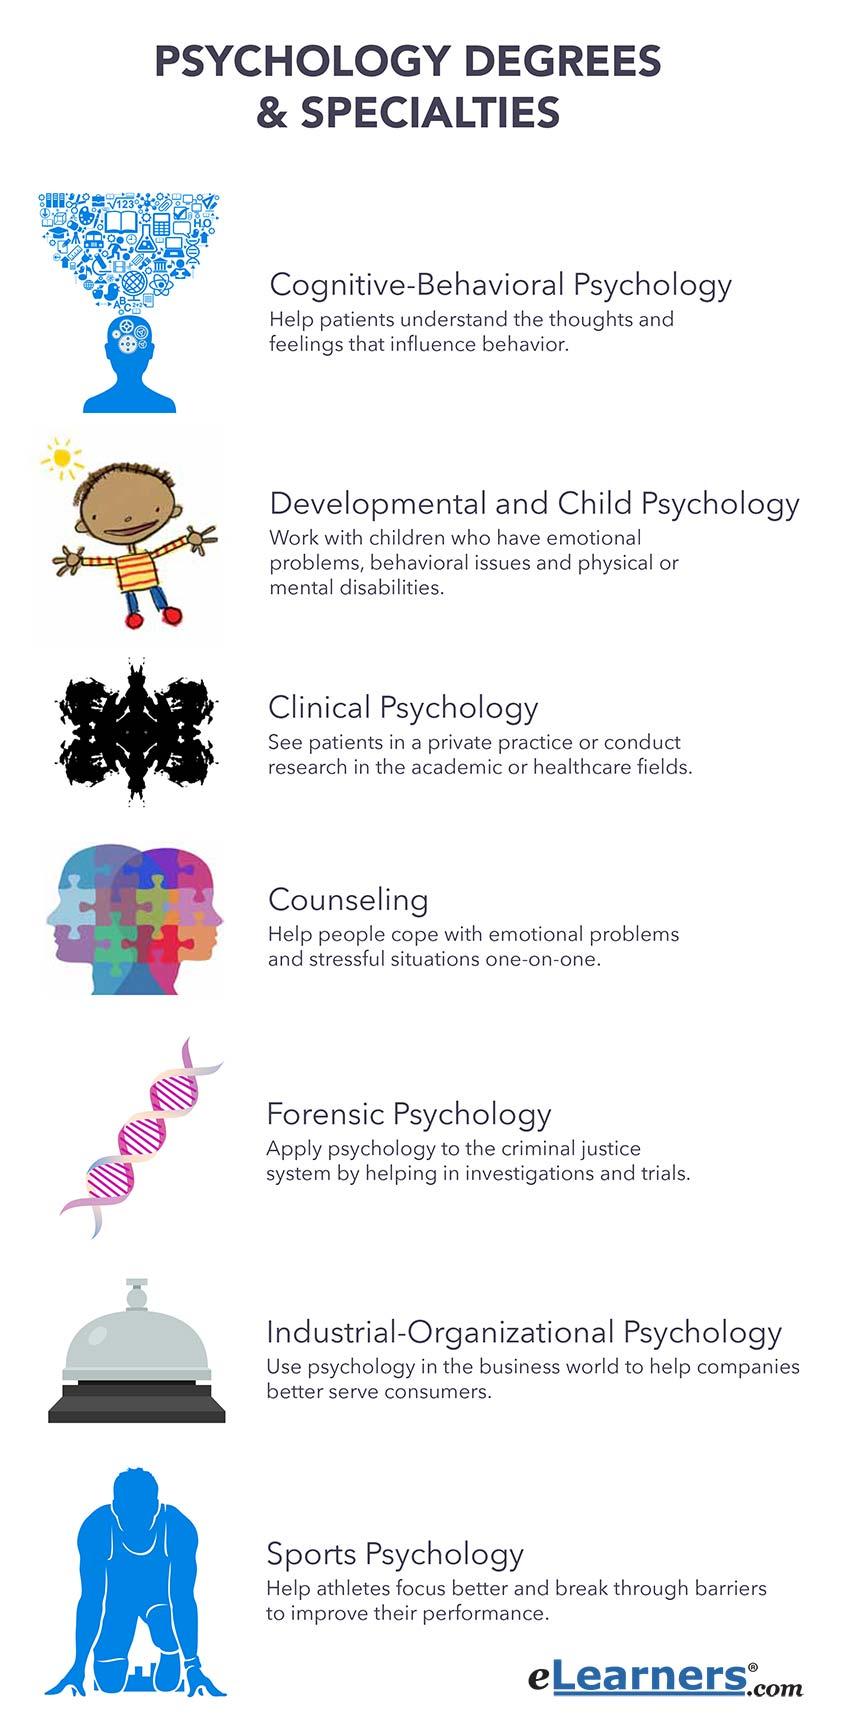 online psychology degrees | find psychology degree online, Human Body